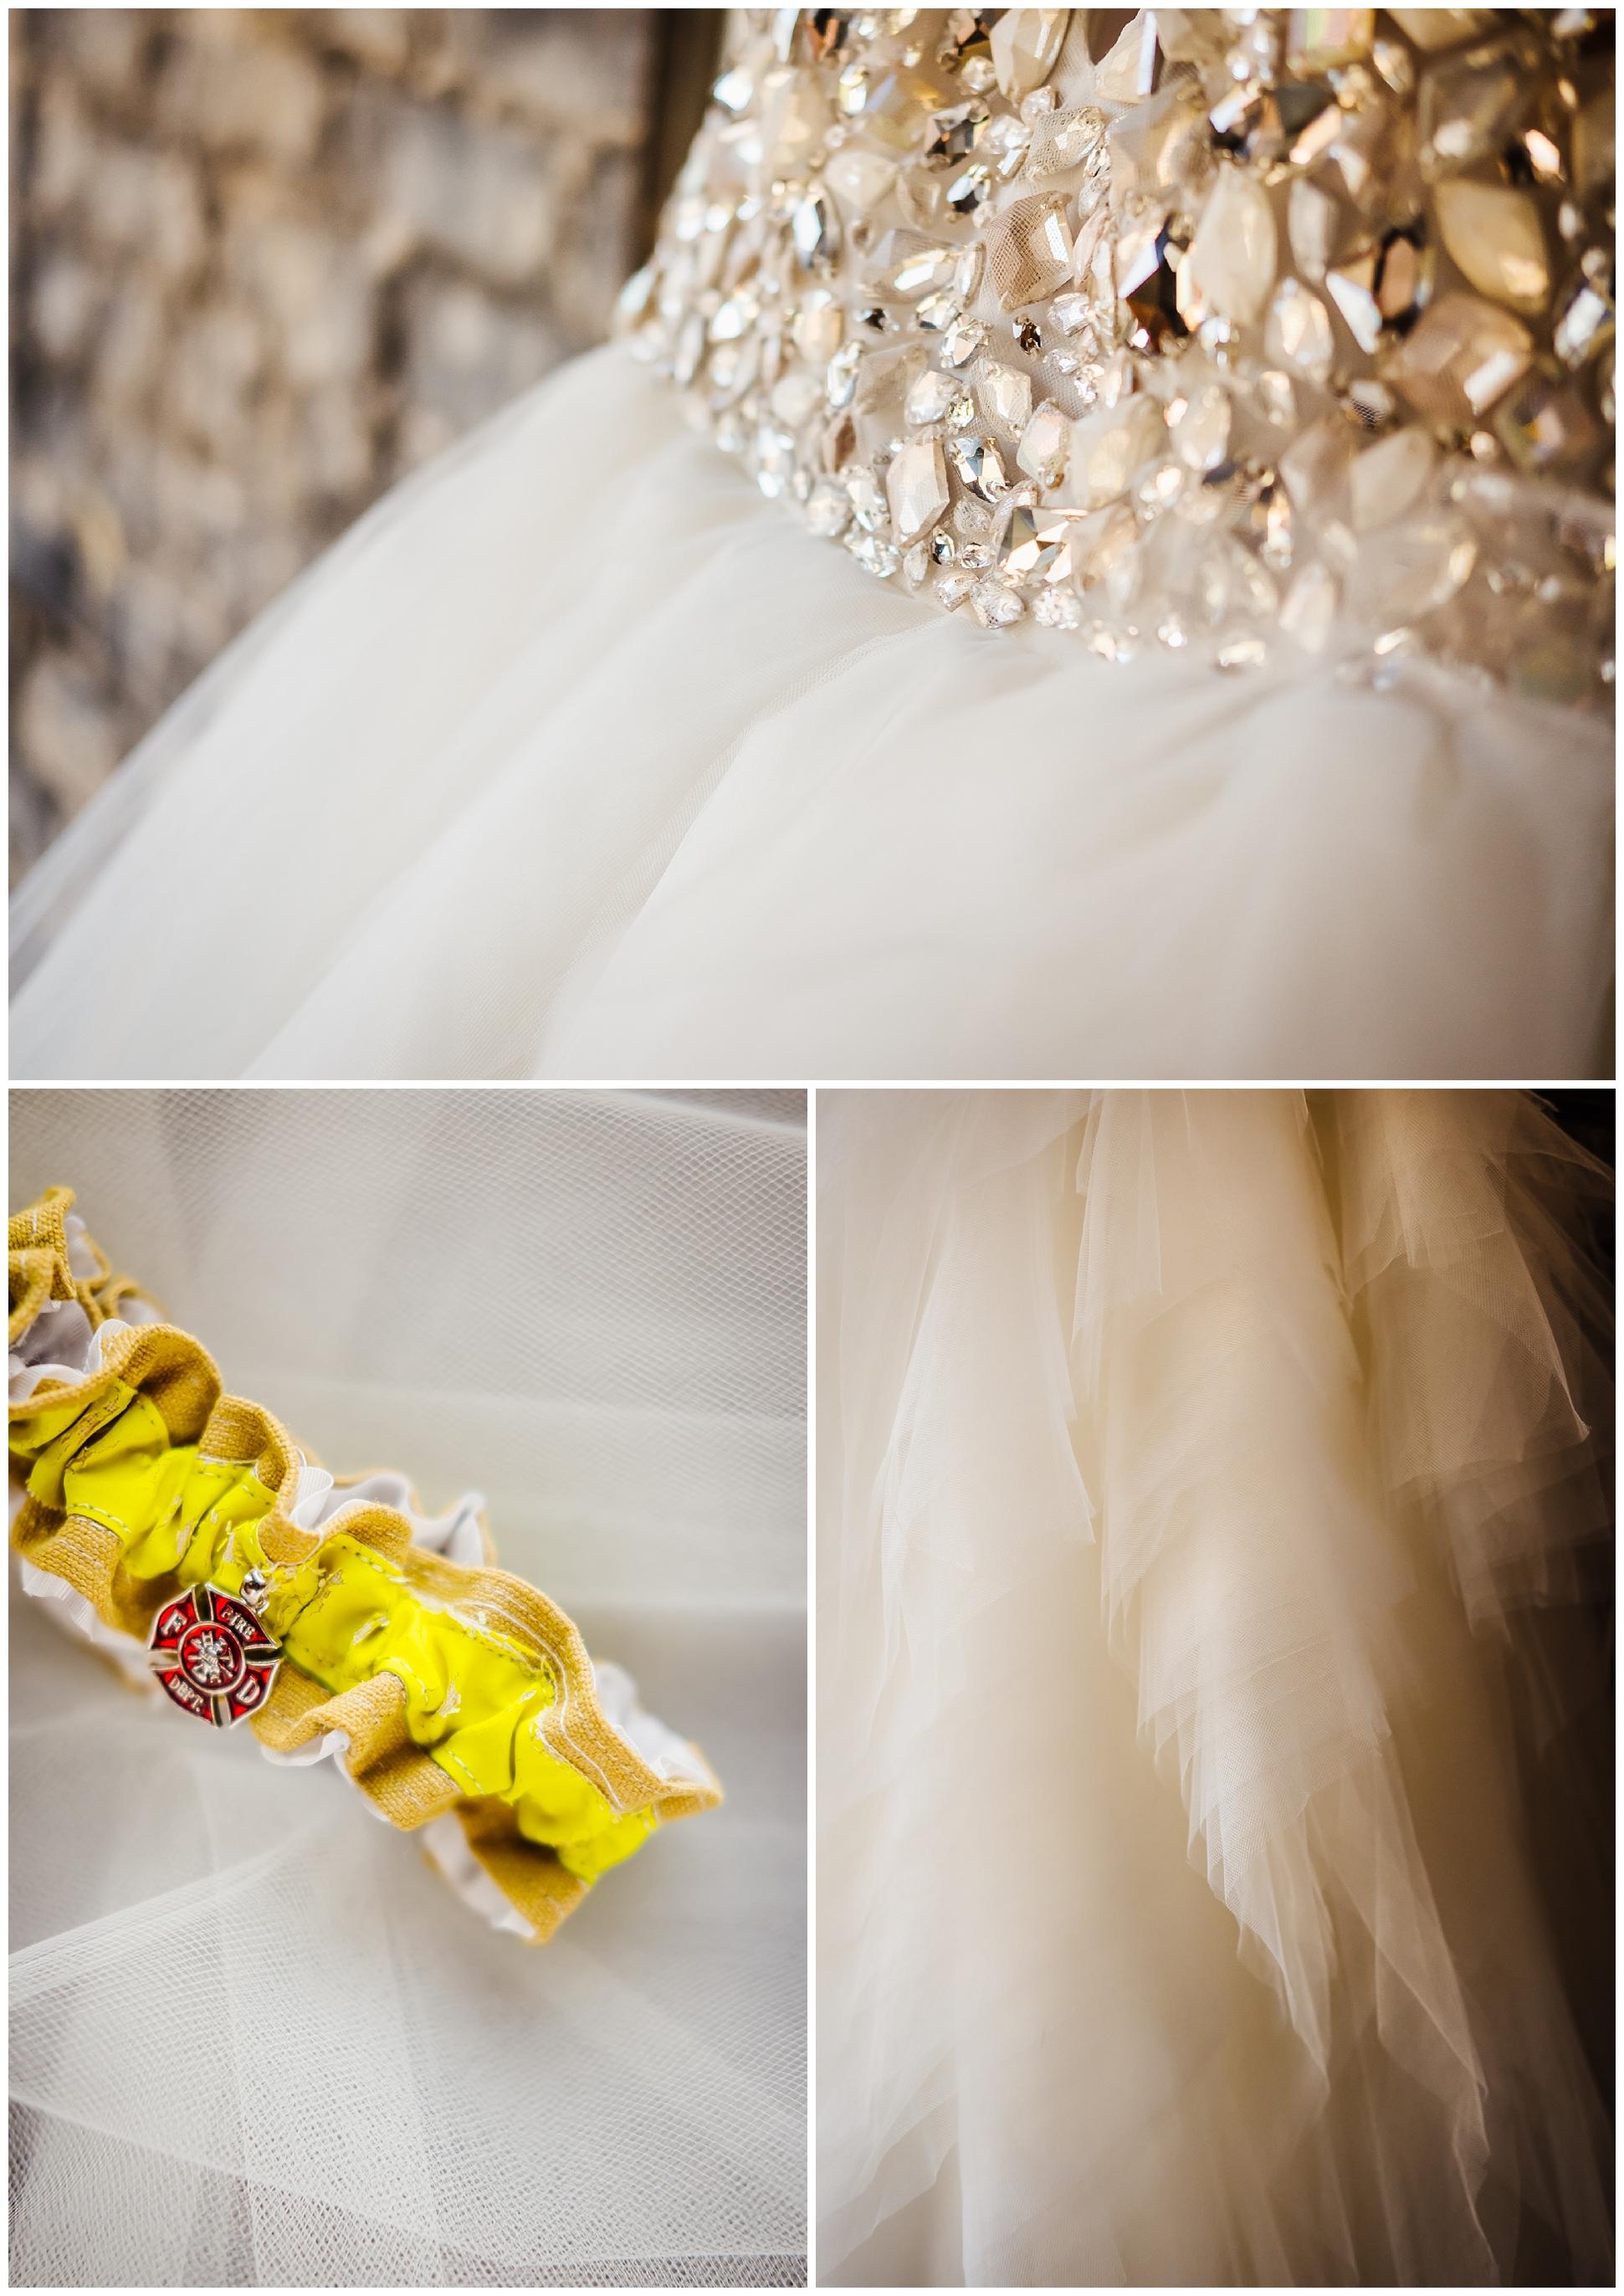 tampa-wedding-photographer-oxford-exchange-garland-candlelight-gold-hayley-paige_0004.jpg